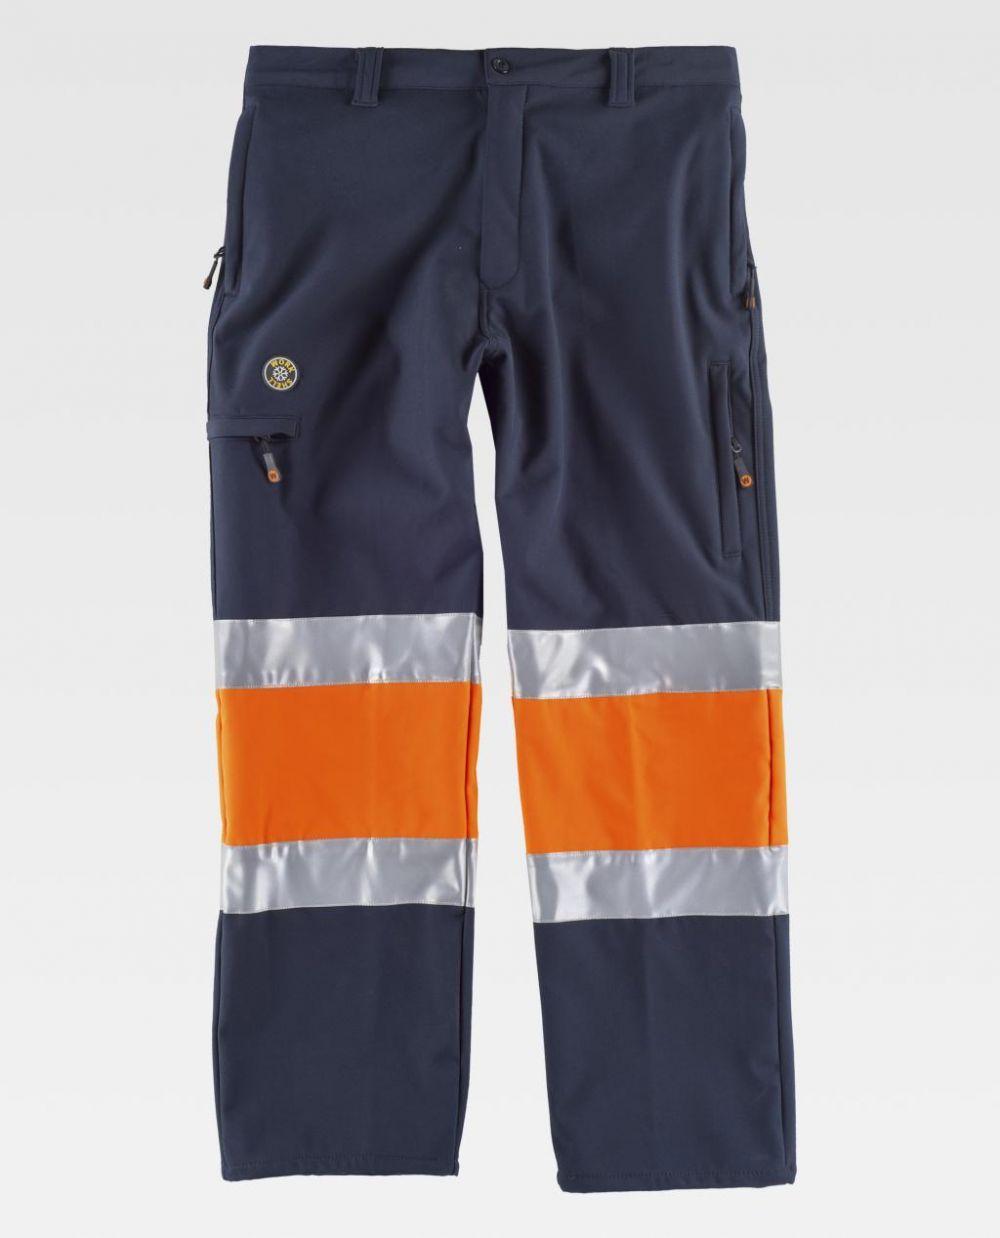 Pantalones reflectantes workteam combinado workshell alta visibilidad de algodon vista 1